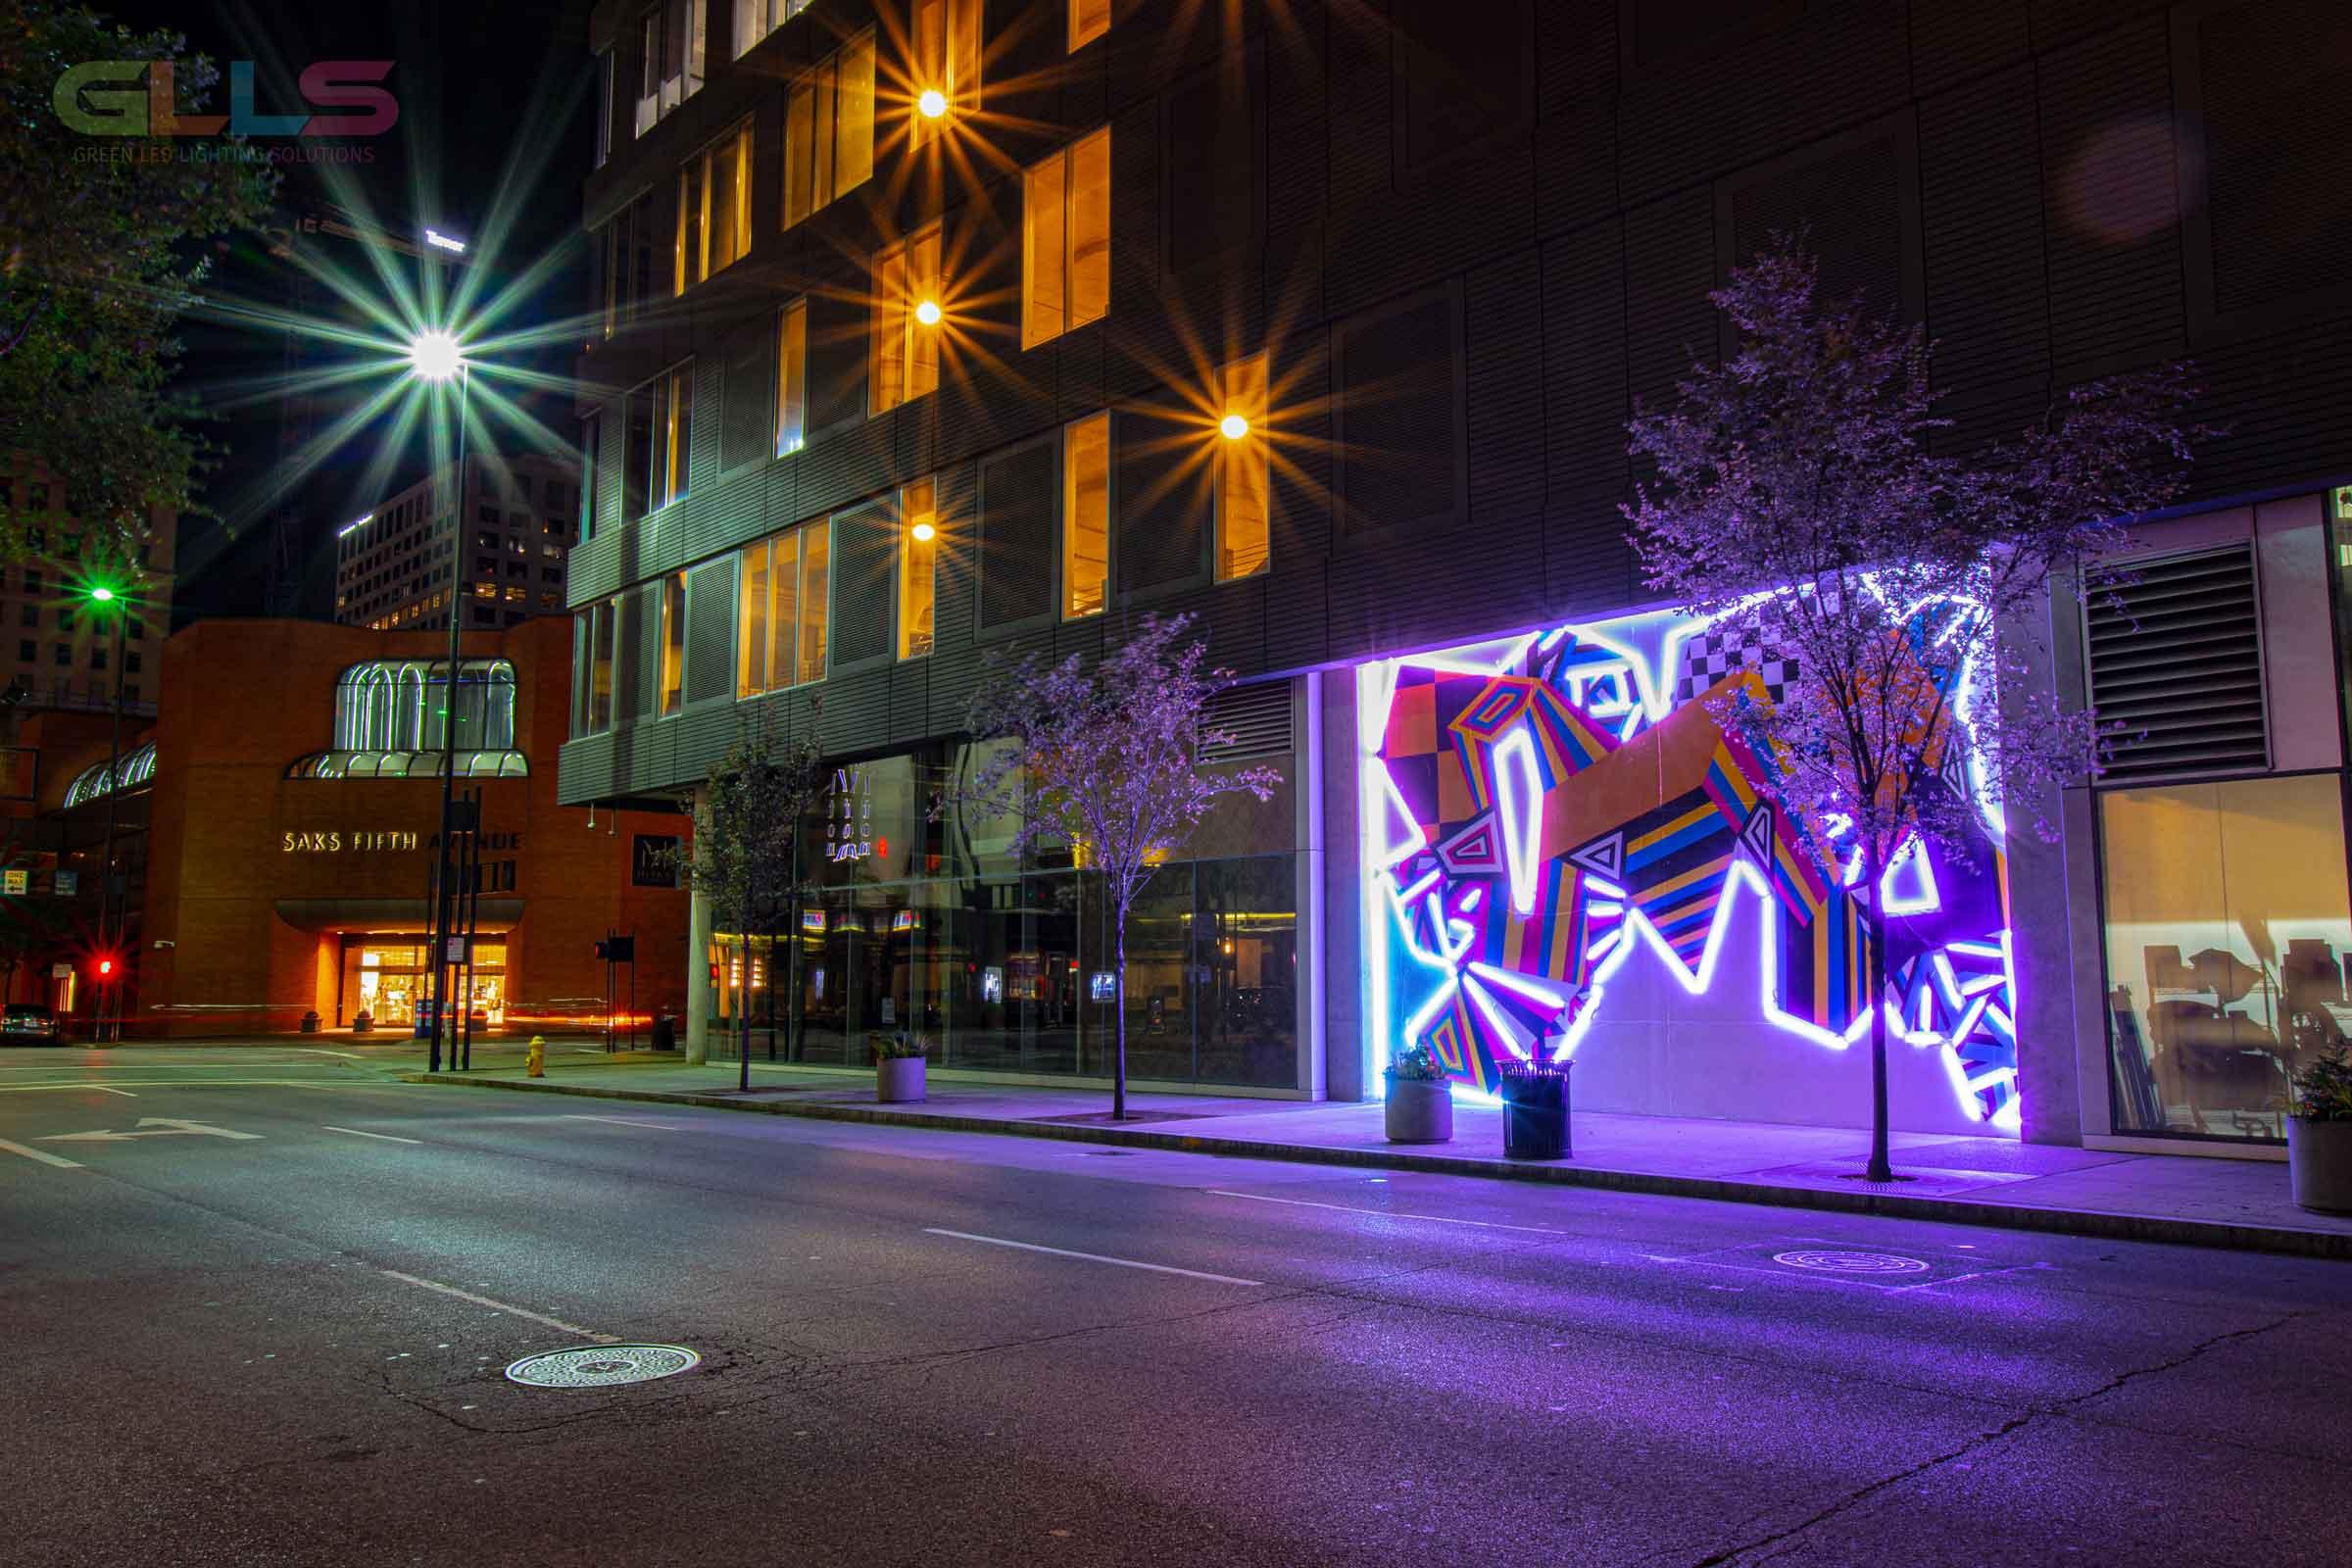 Chase-Melendez-Wall-Mural-Art---Cincinnati4